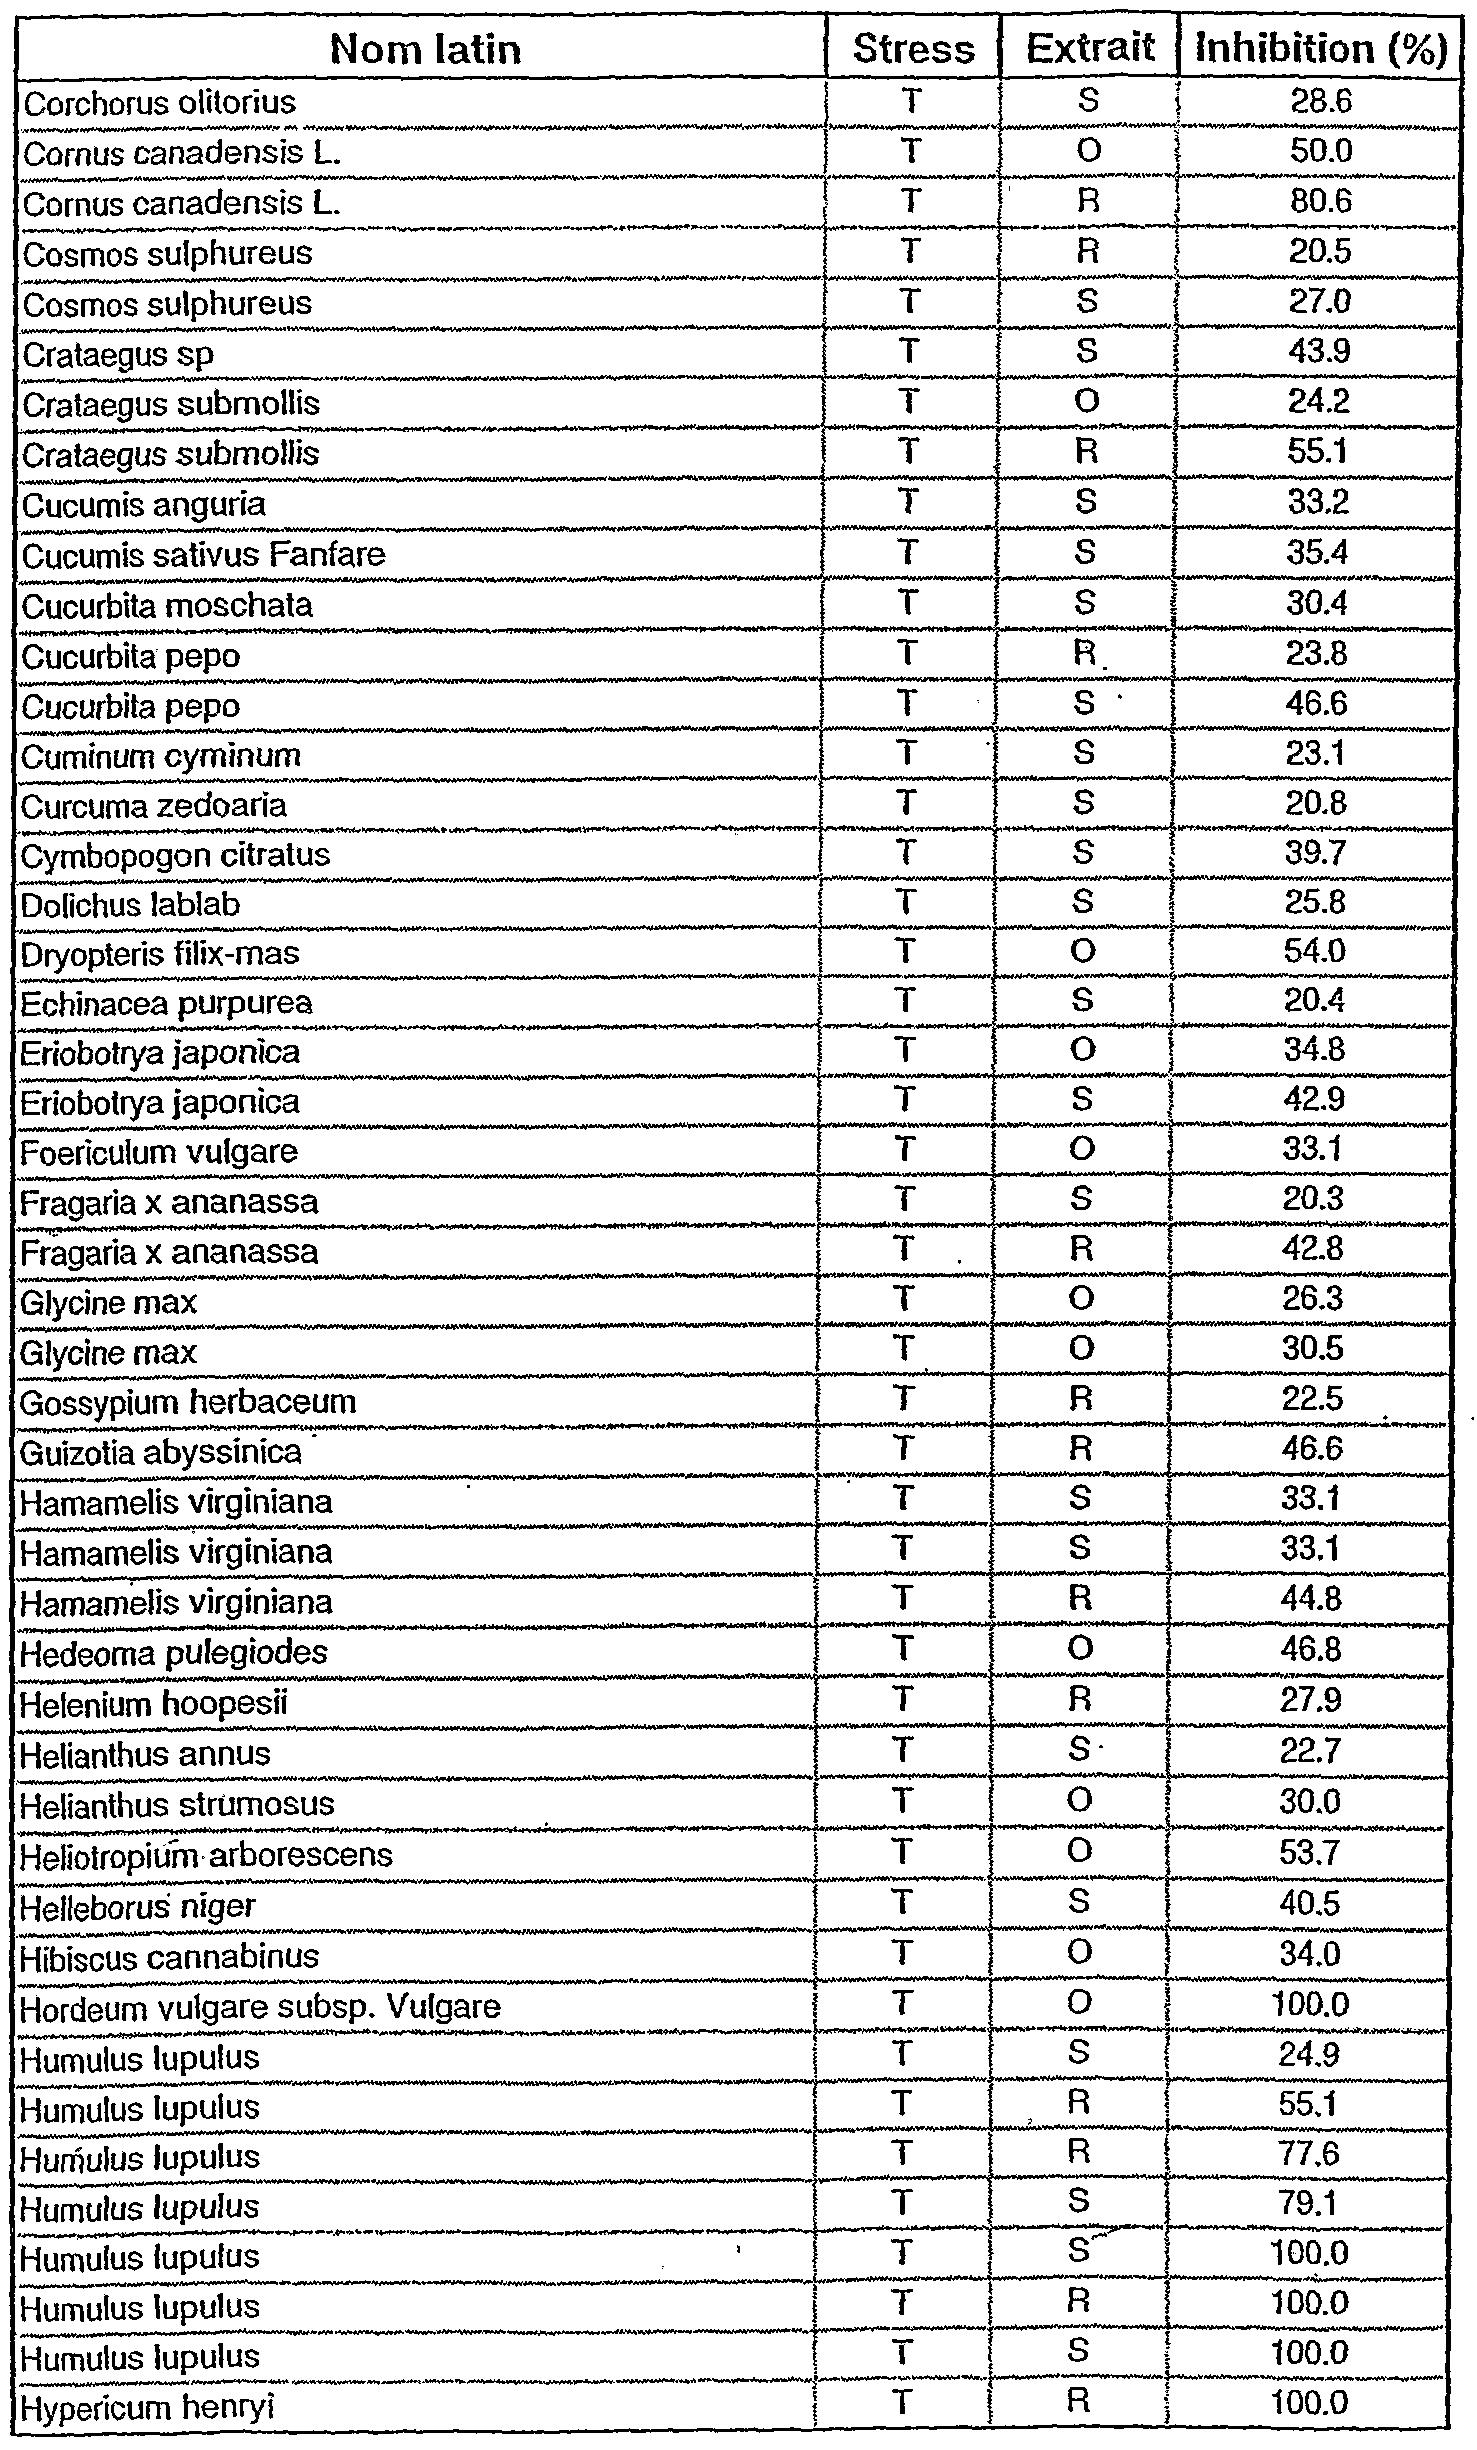 Sidalcea oregano ssp validating